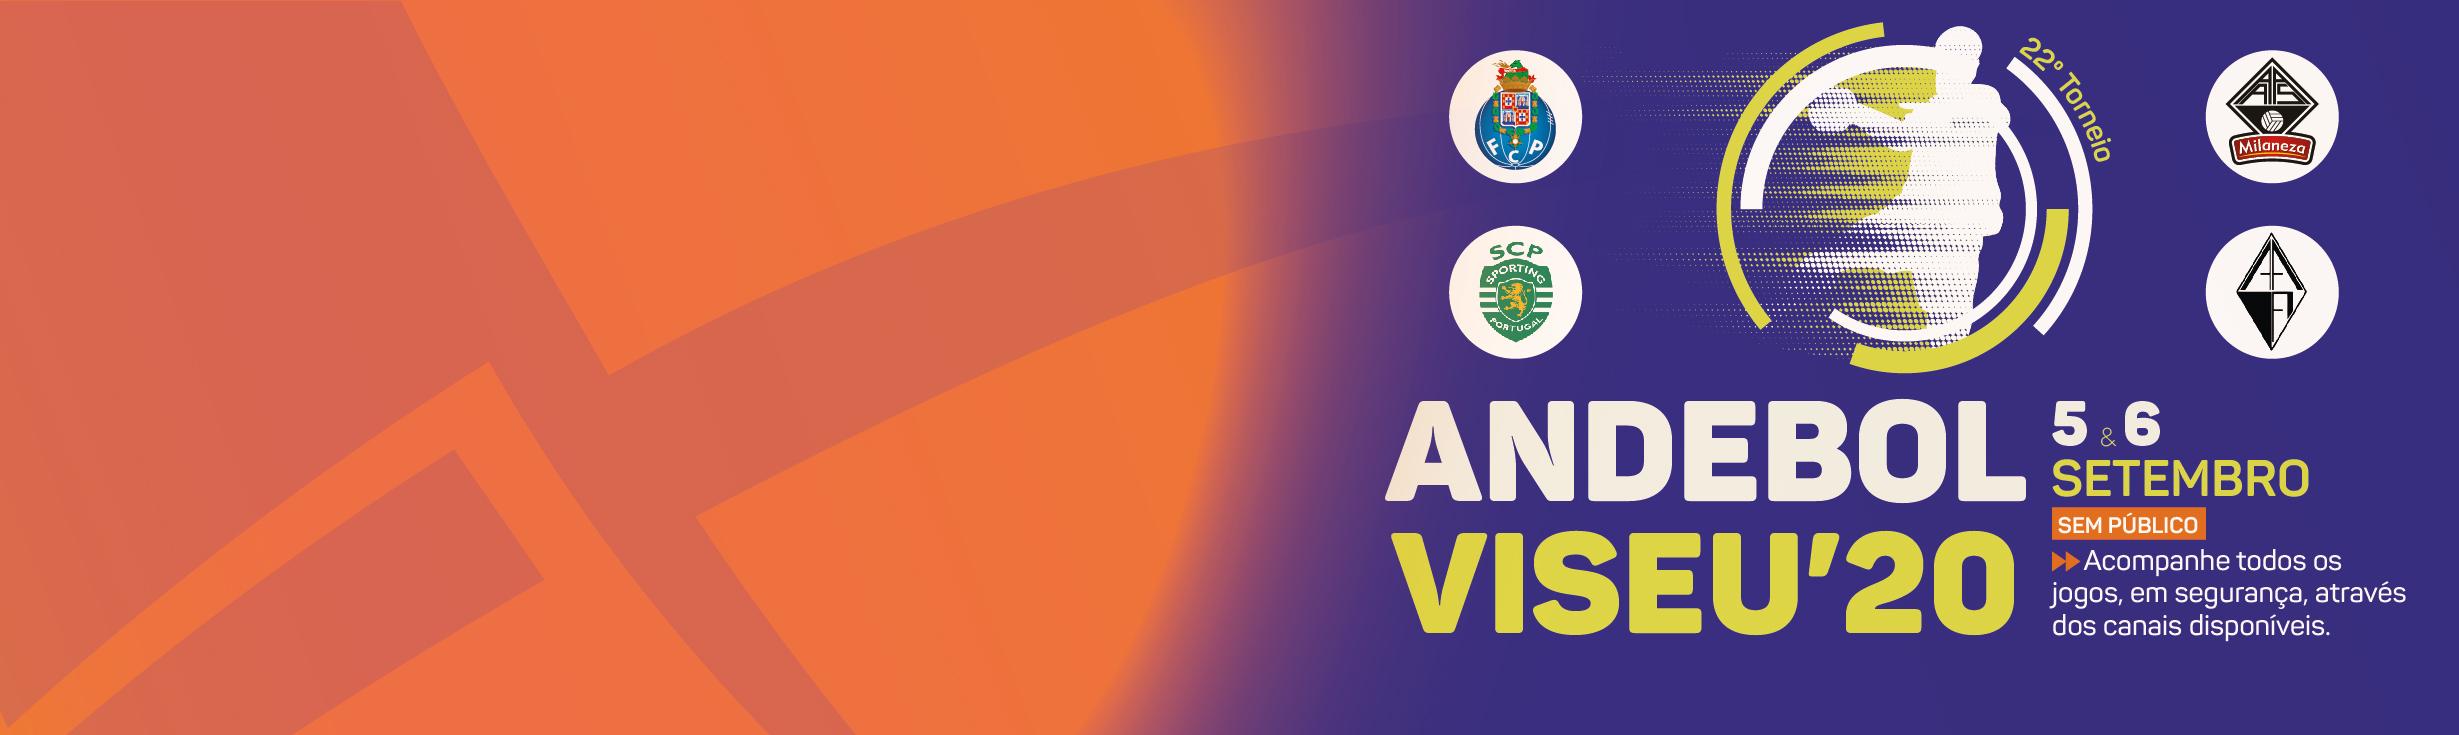 22º Torneio Andebol Viseu 2020